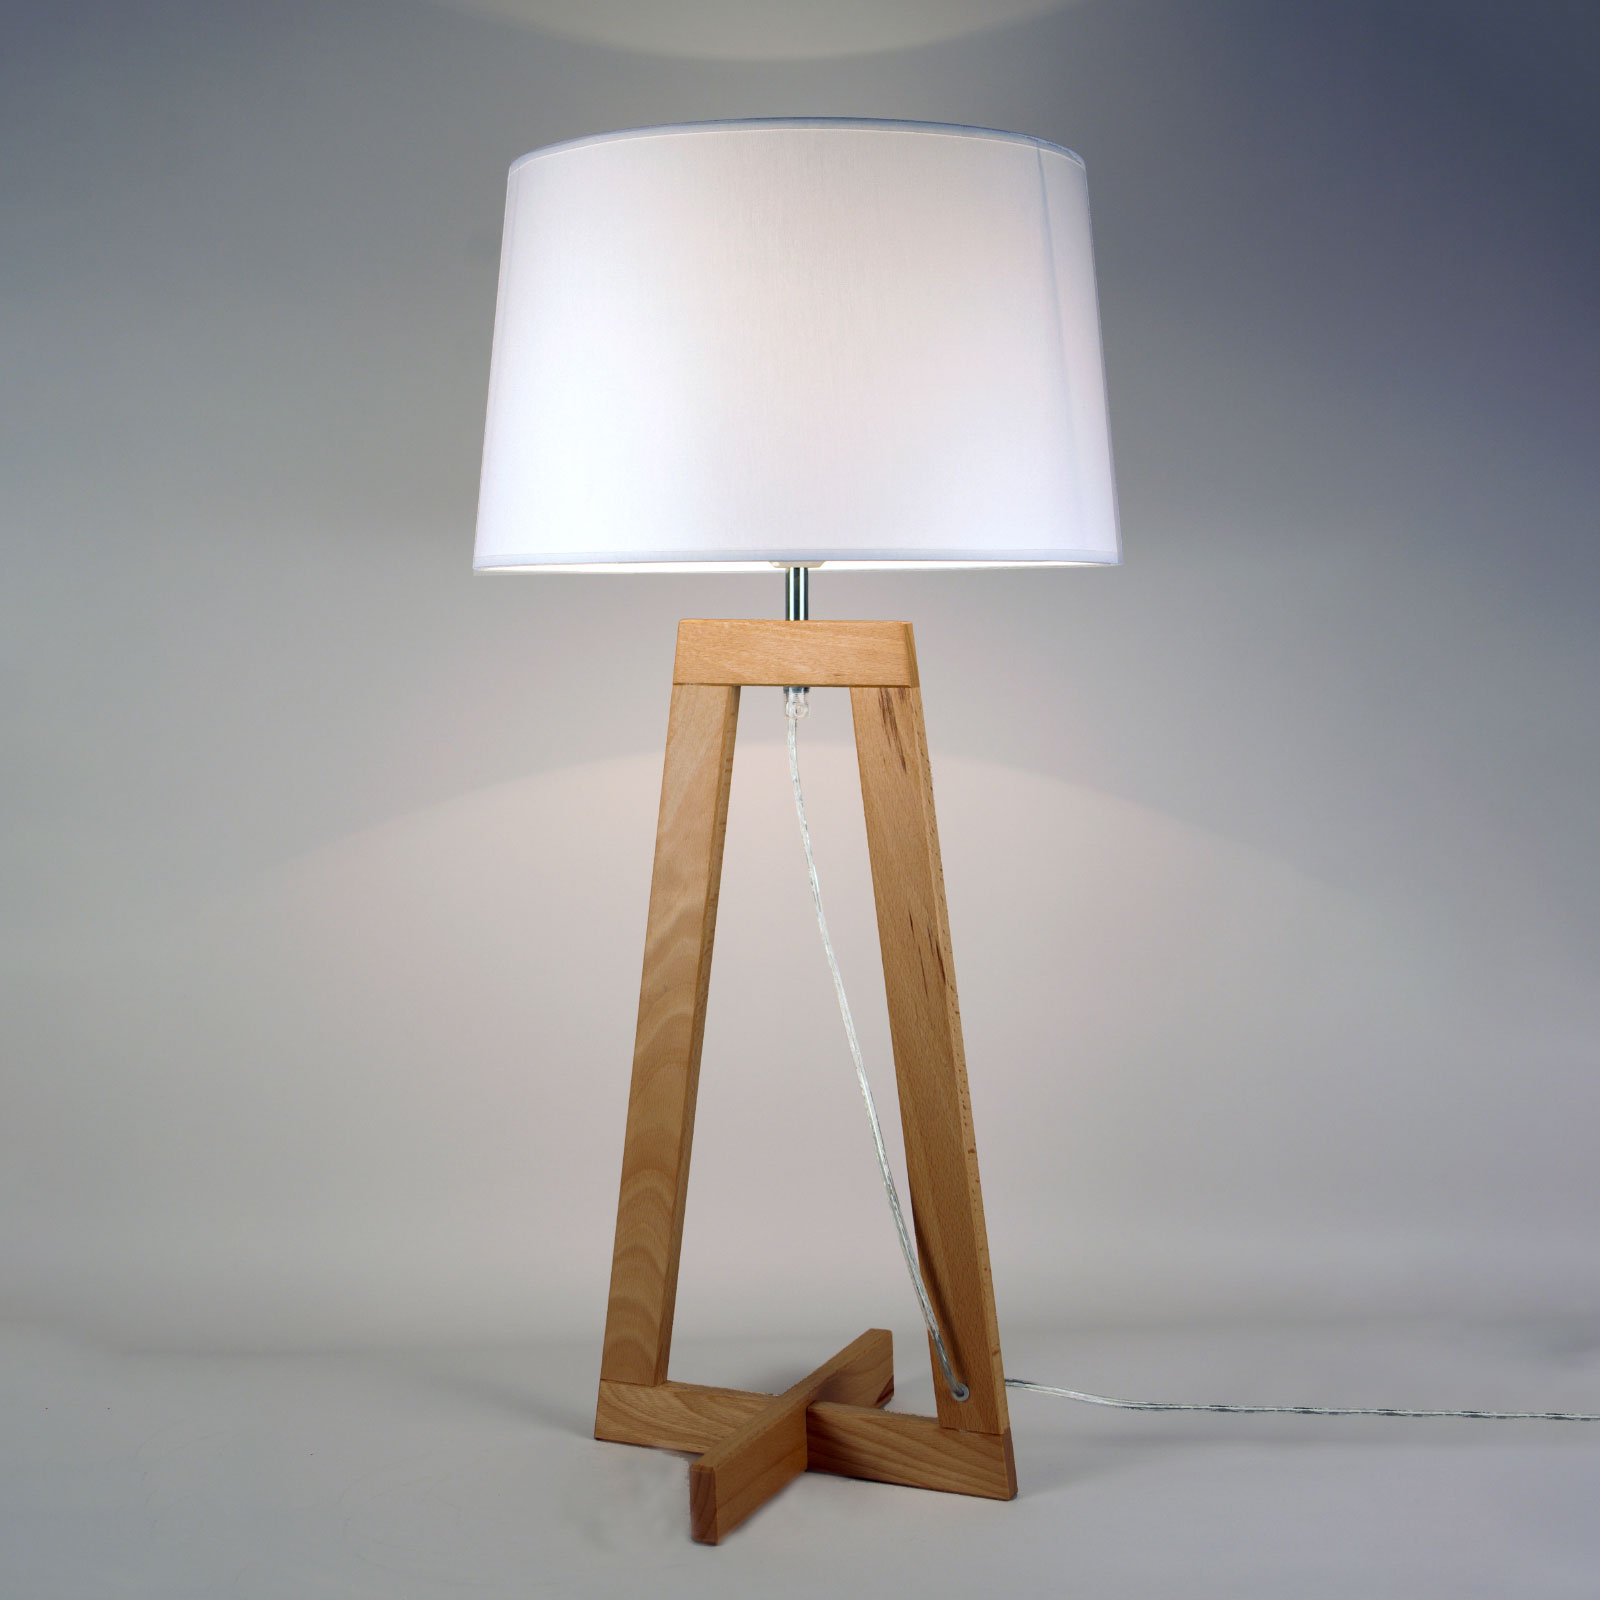 Lampe à poser Sacha LT en tissu et bois